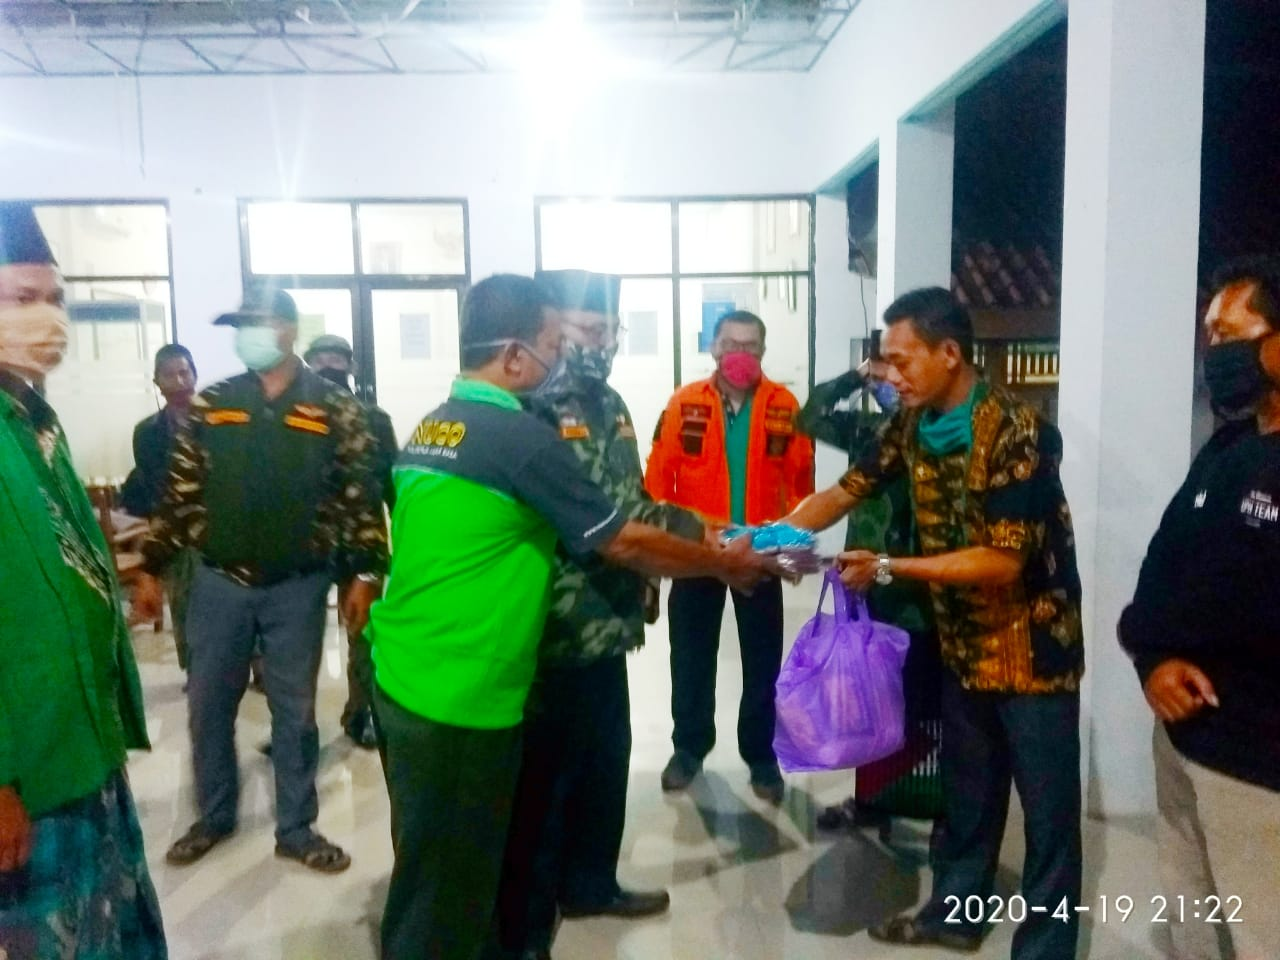 Bantuan PCNU Kabupaten Tegal Peduli Sasar Warga Isolasi Covid-19 Bumiharja, GP Ansor